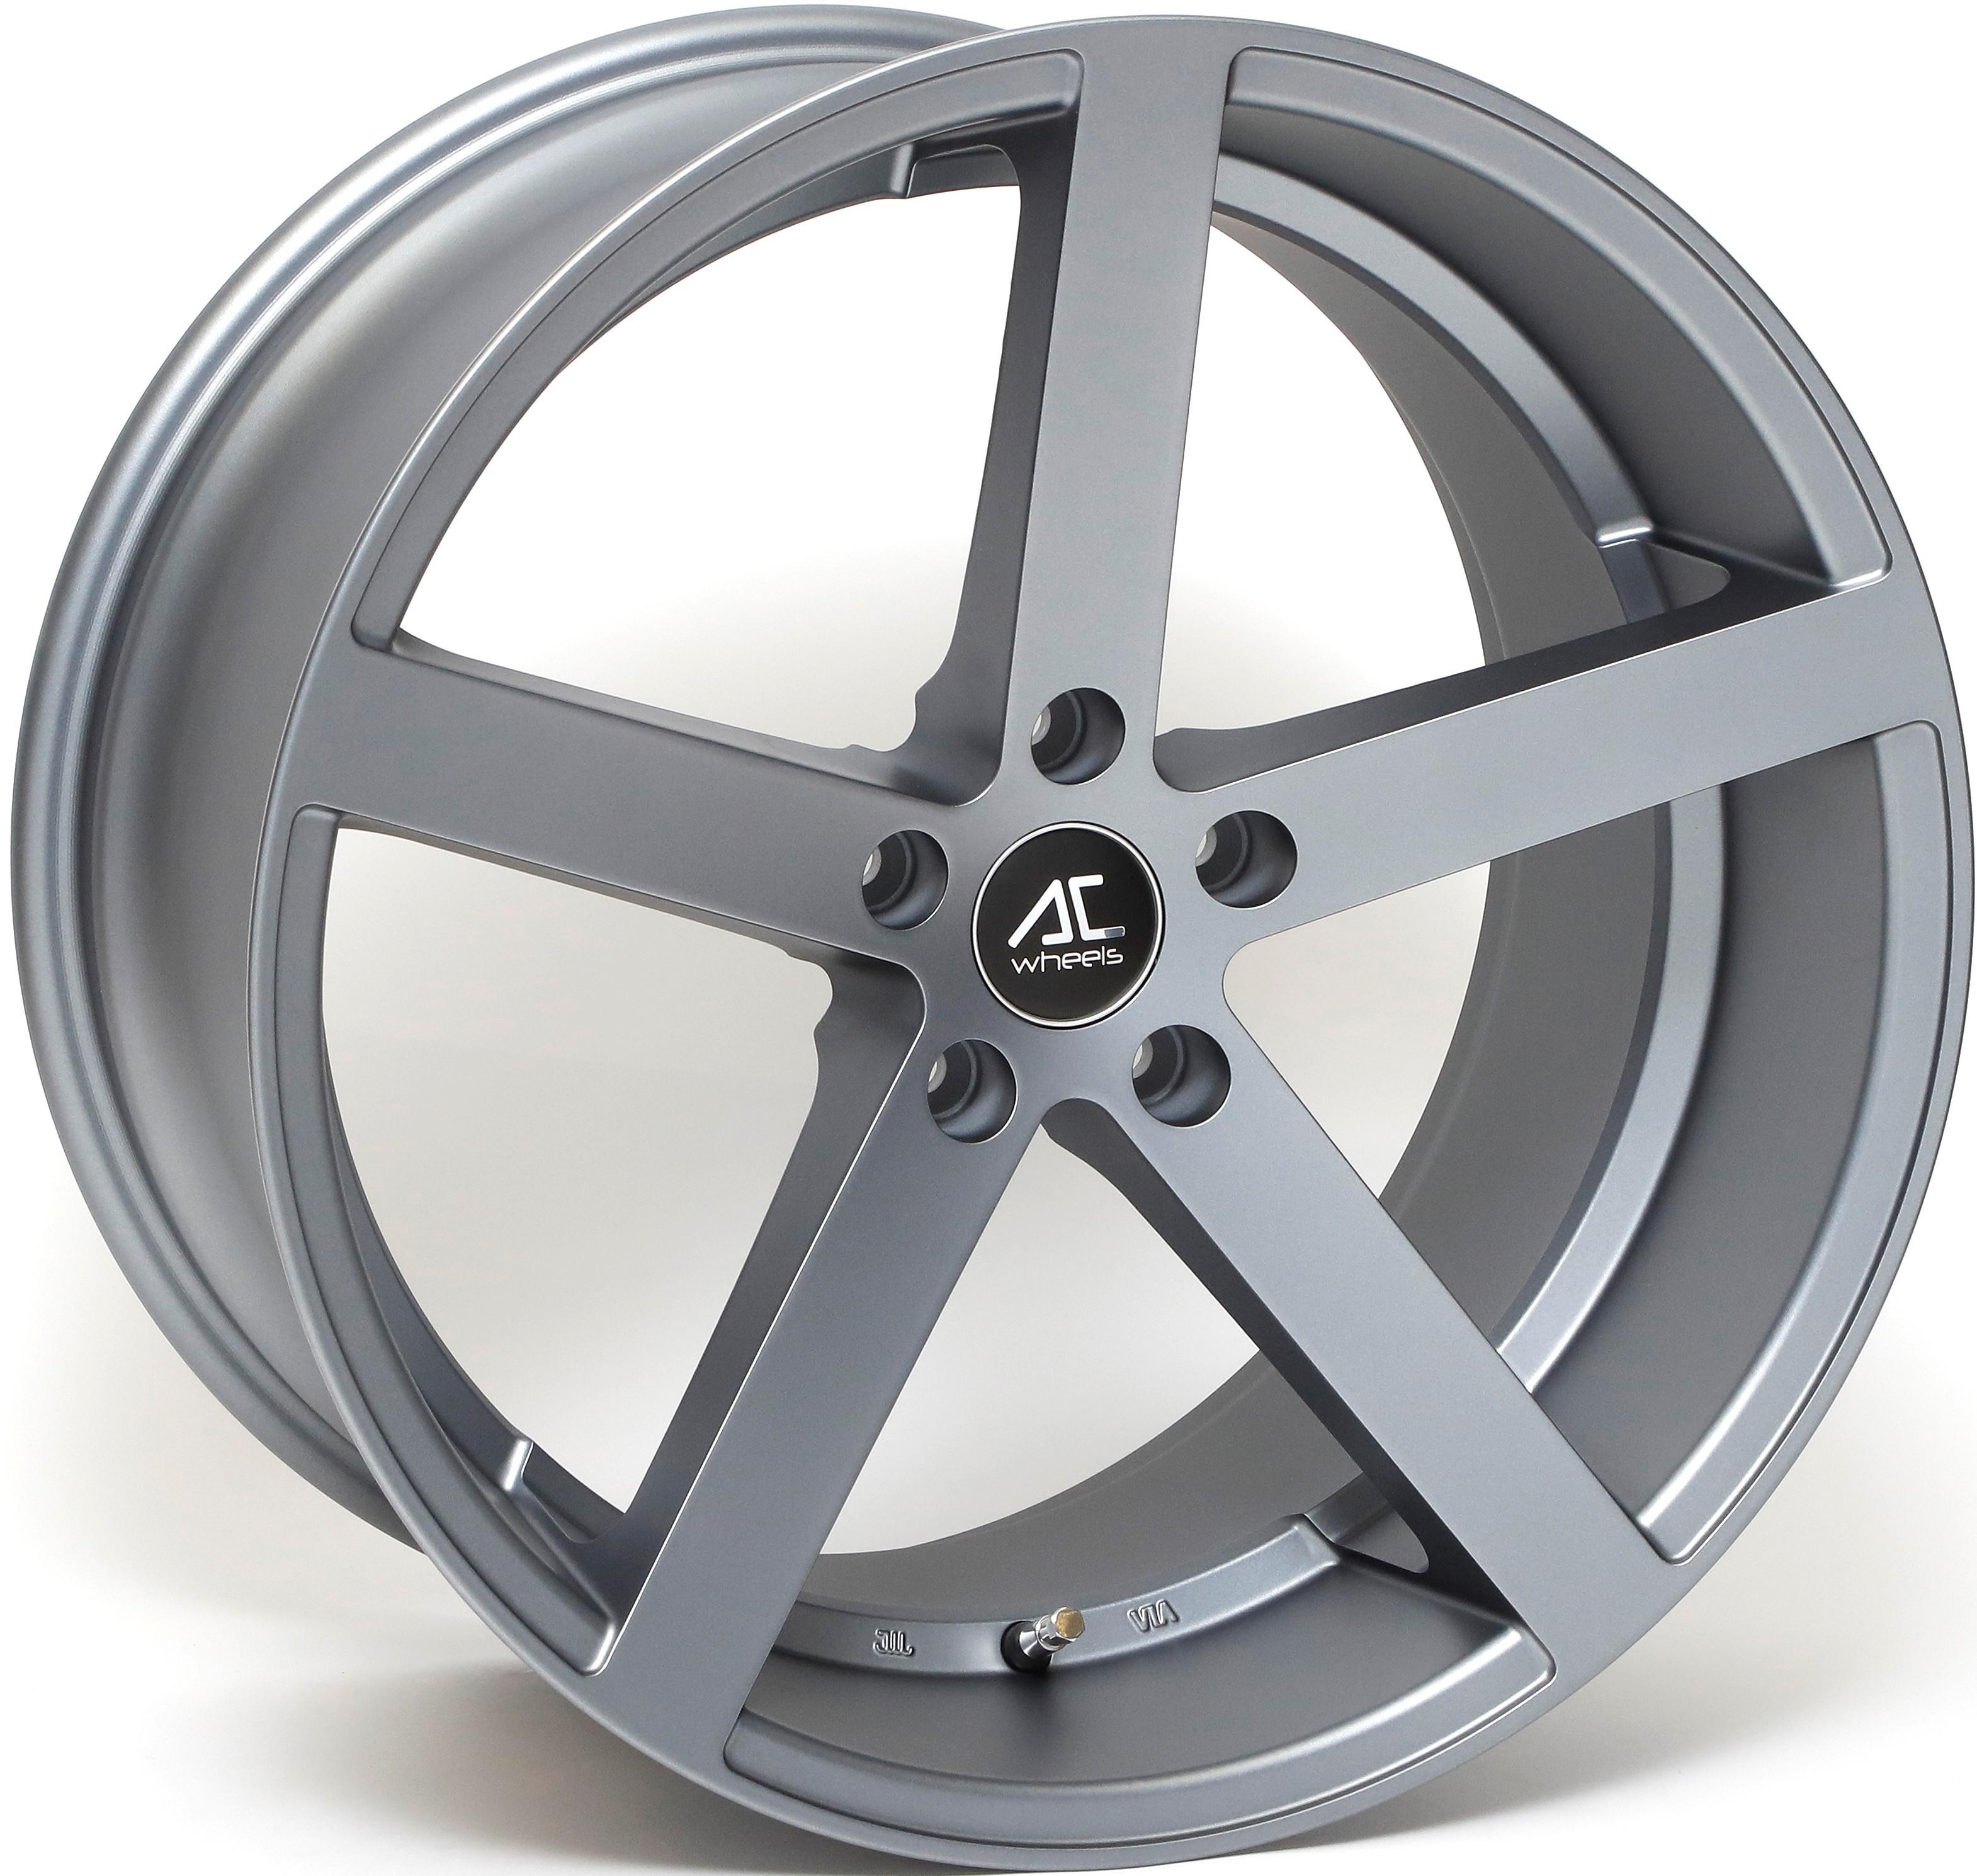 AC Wheels - Star 5 (Matt Grey)